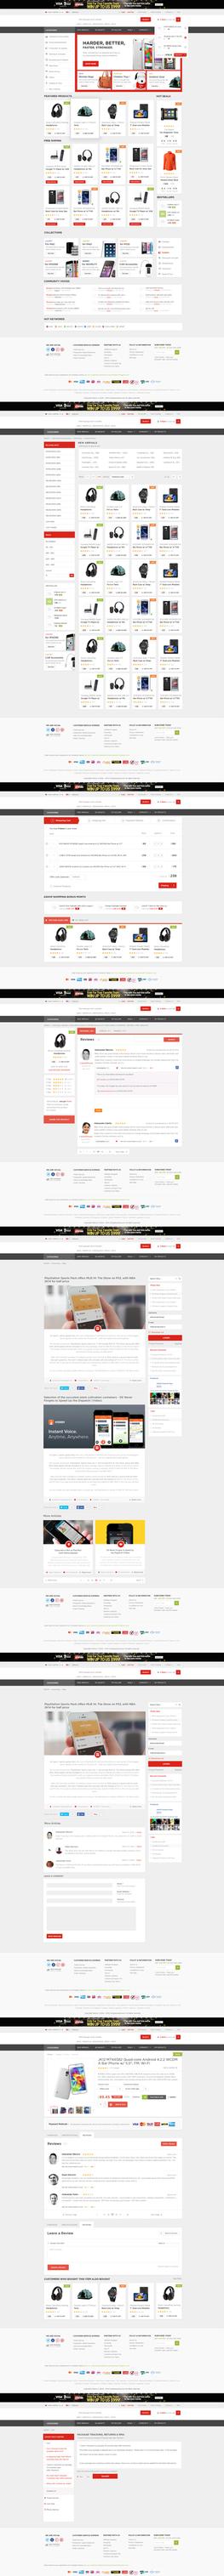 Ecommerce Shop Web Design For Sale by vasiligfx